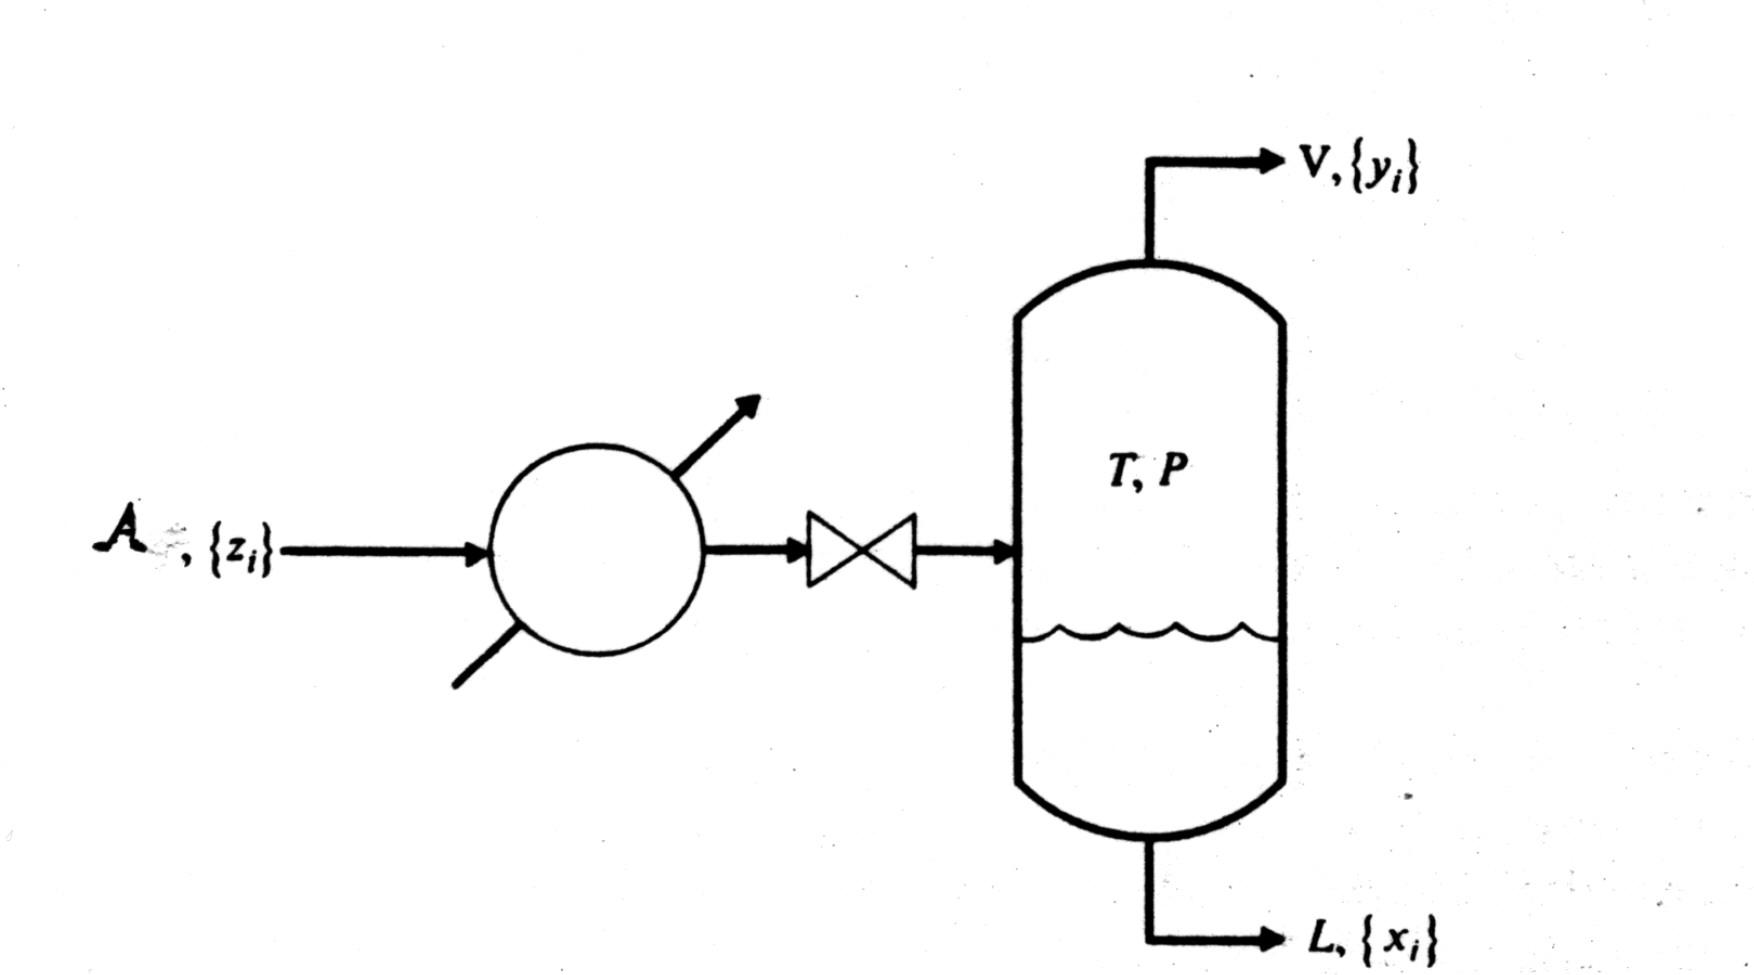 14 C  lculo del flash Isotermico  T  P      documentaci  n de